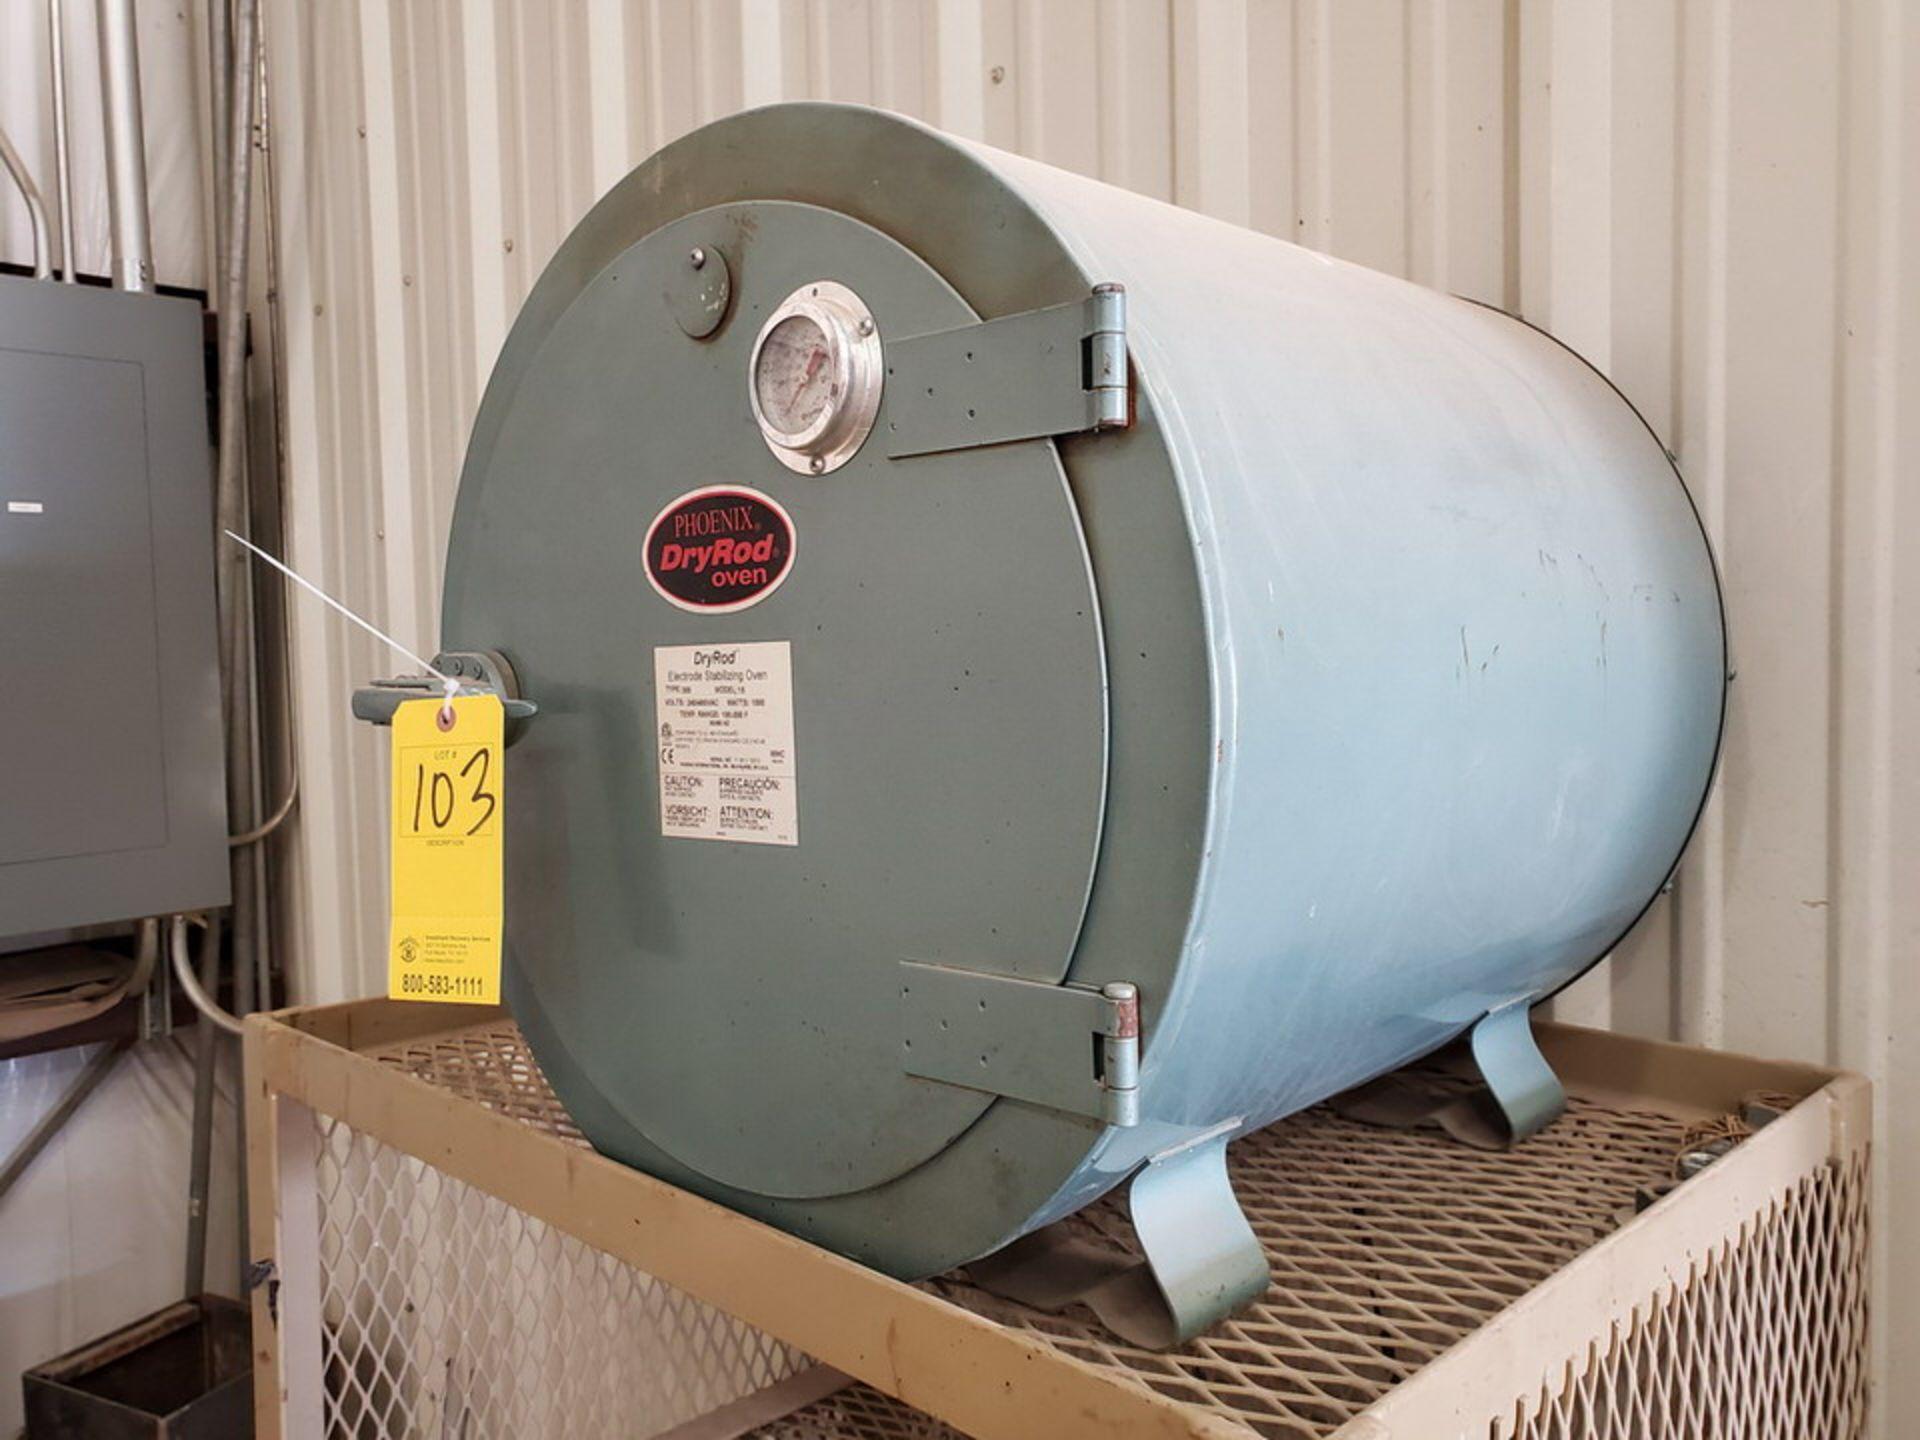 Phoenix 15 Dry Rod Oven 240/480V, 1,000W, 50/60HZ, Temp Range: 100-550F